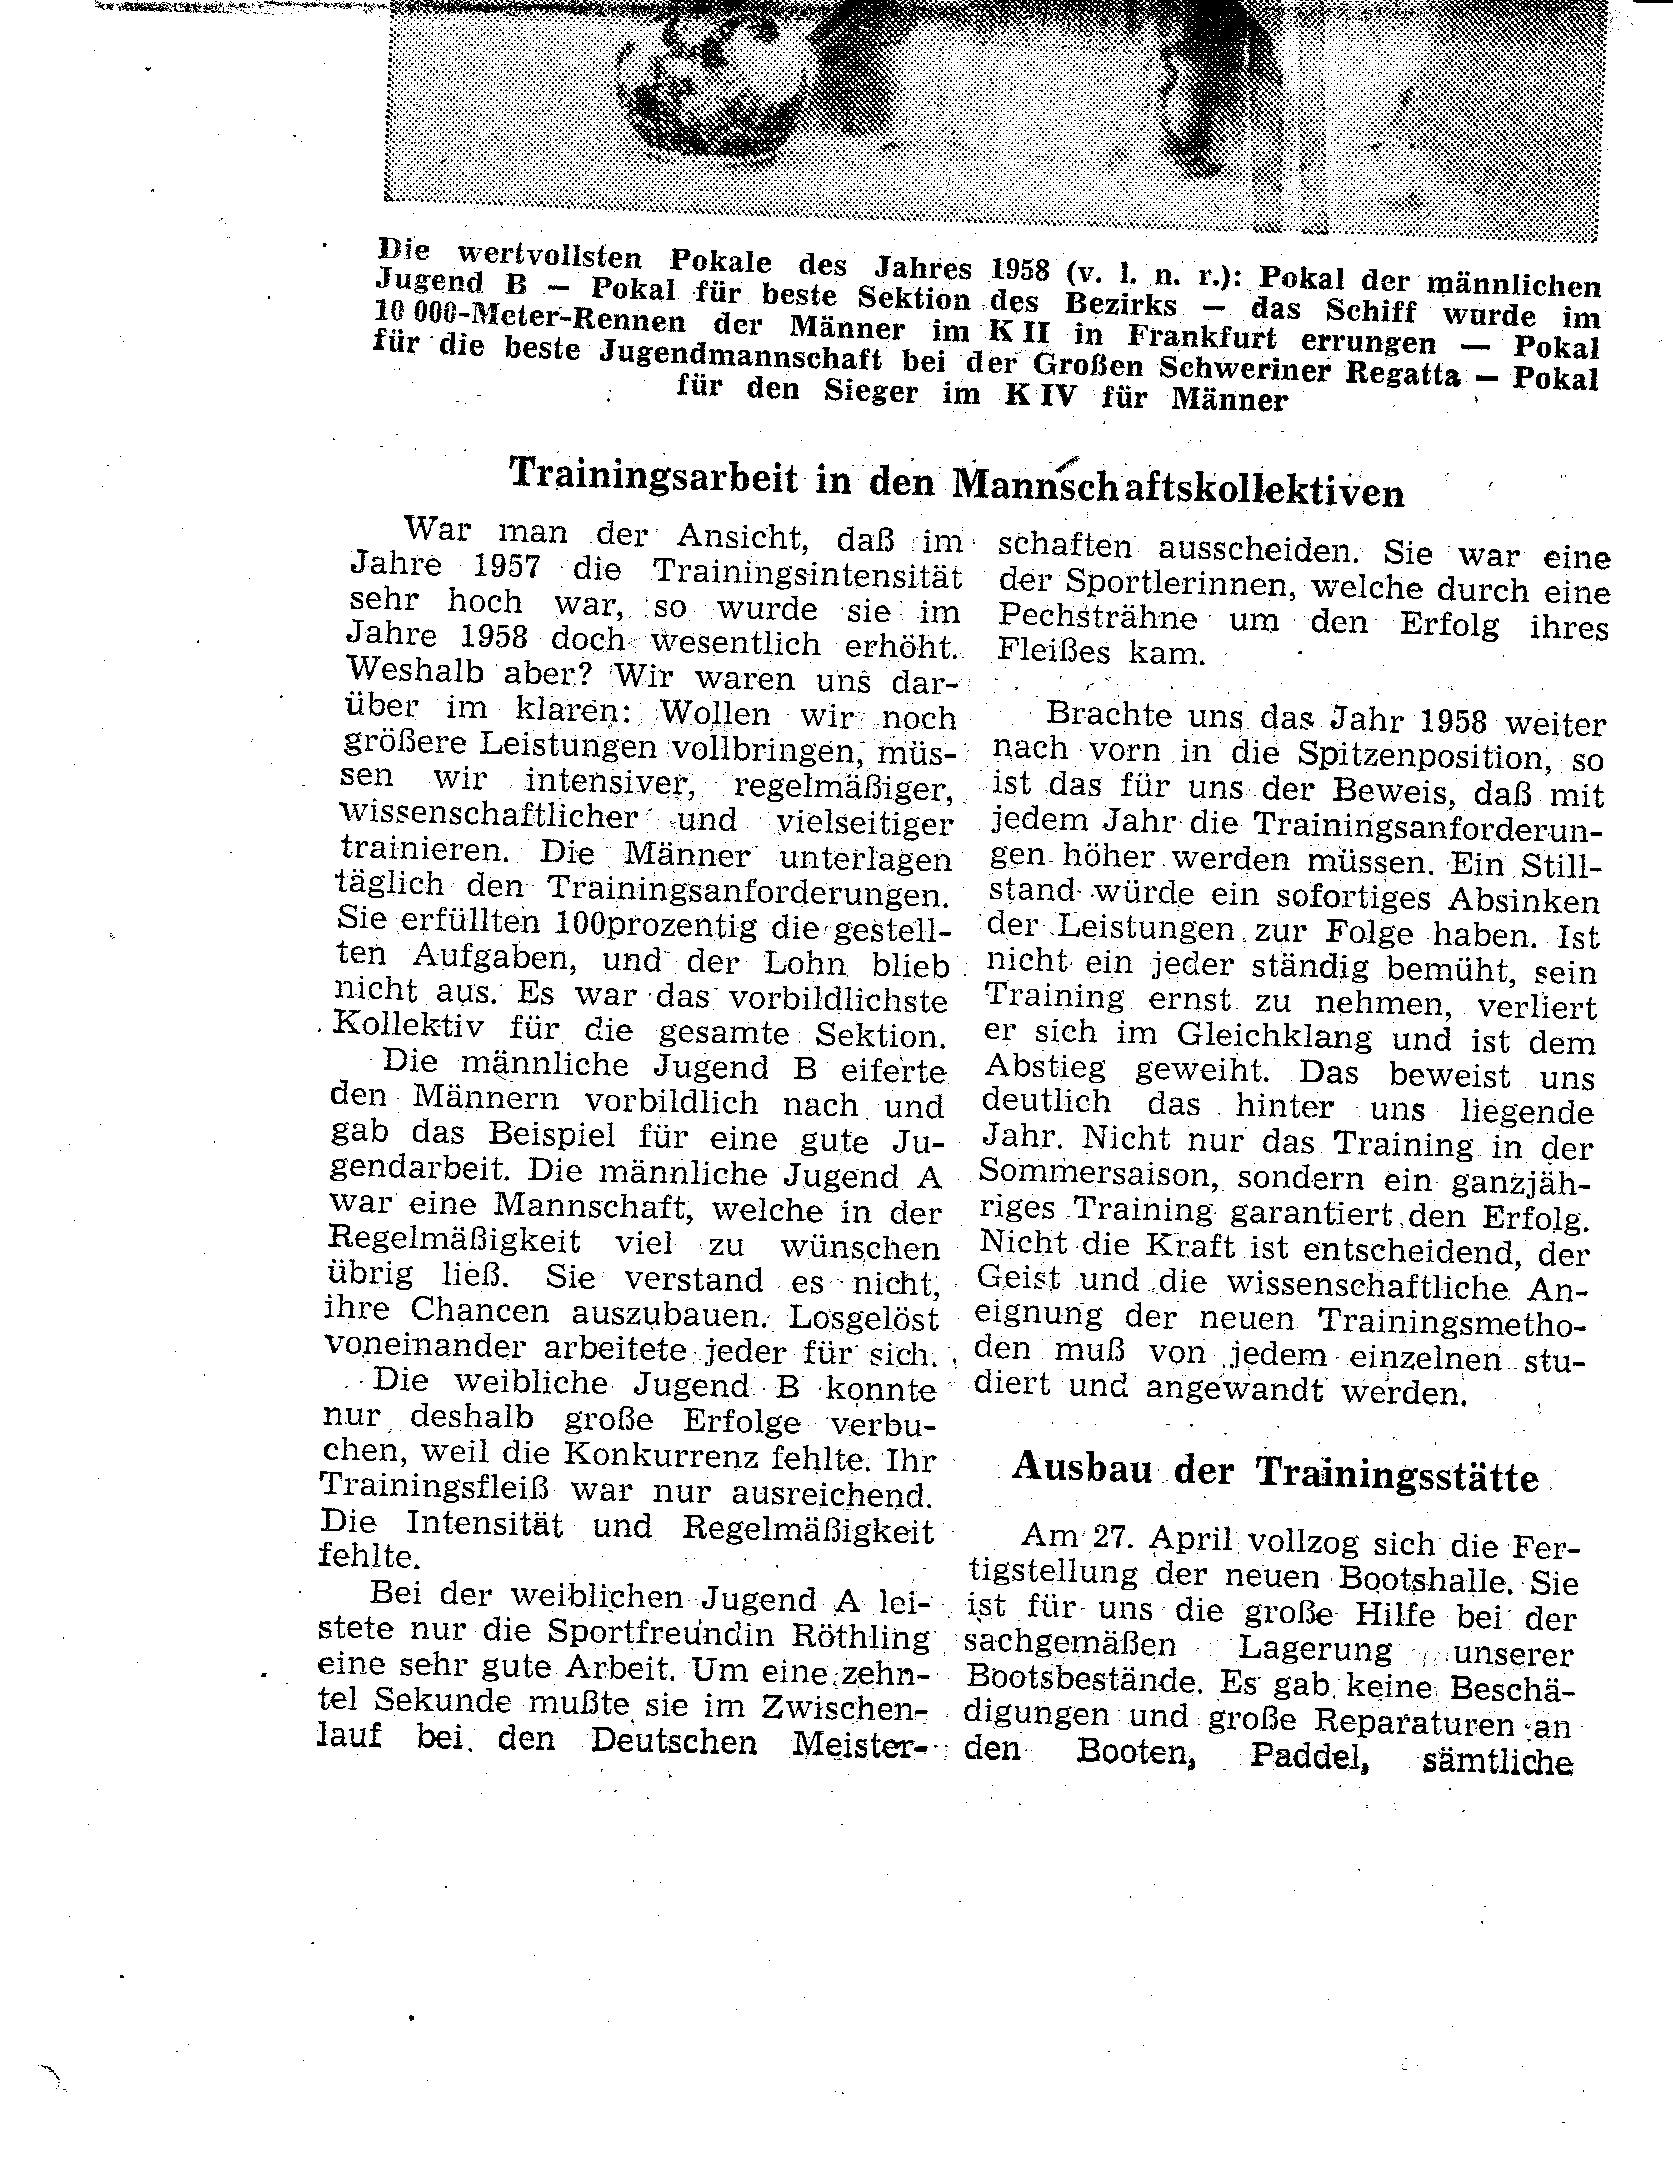 1958 Trainingsarbeit in den Mannschaftskollektiven